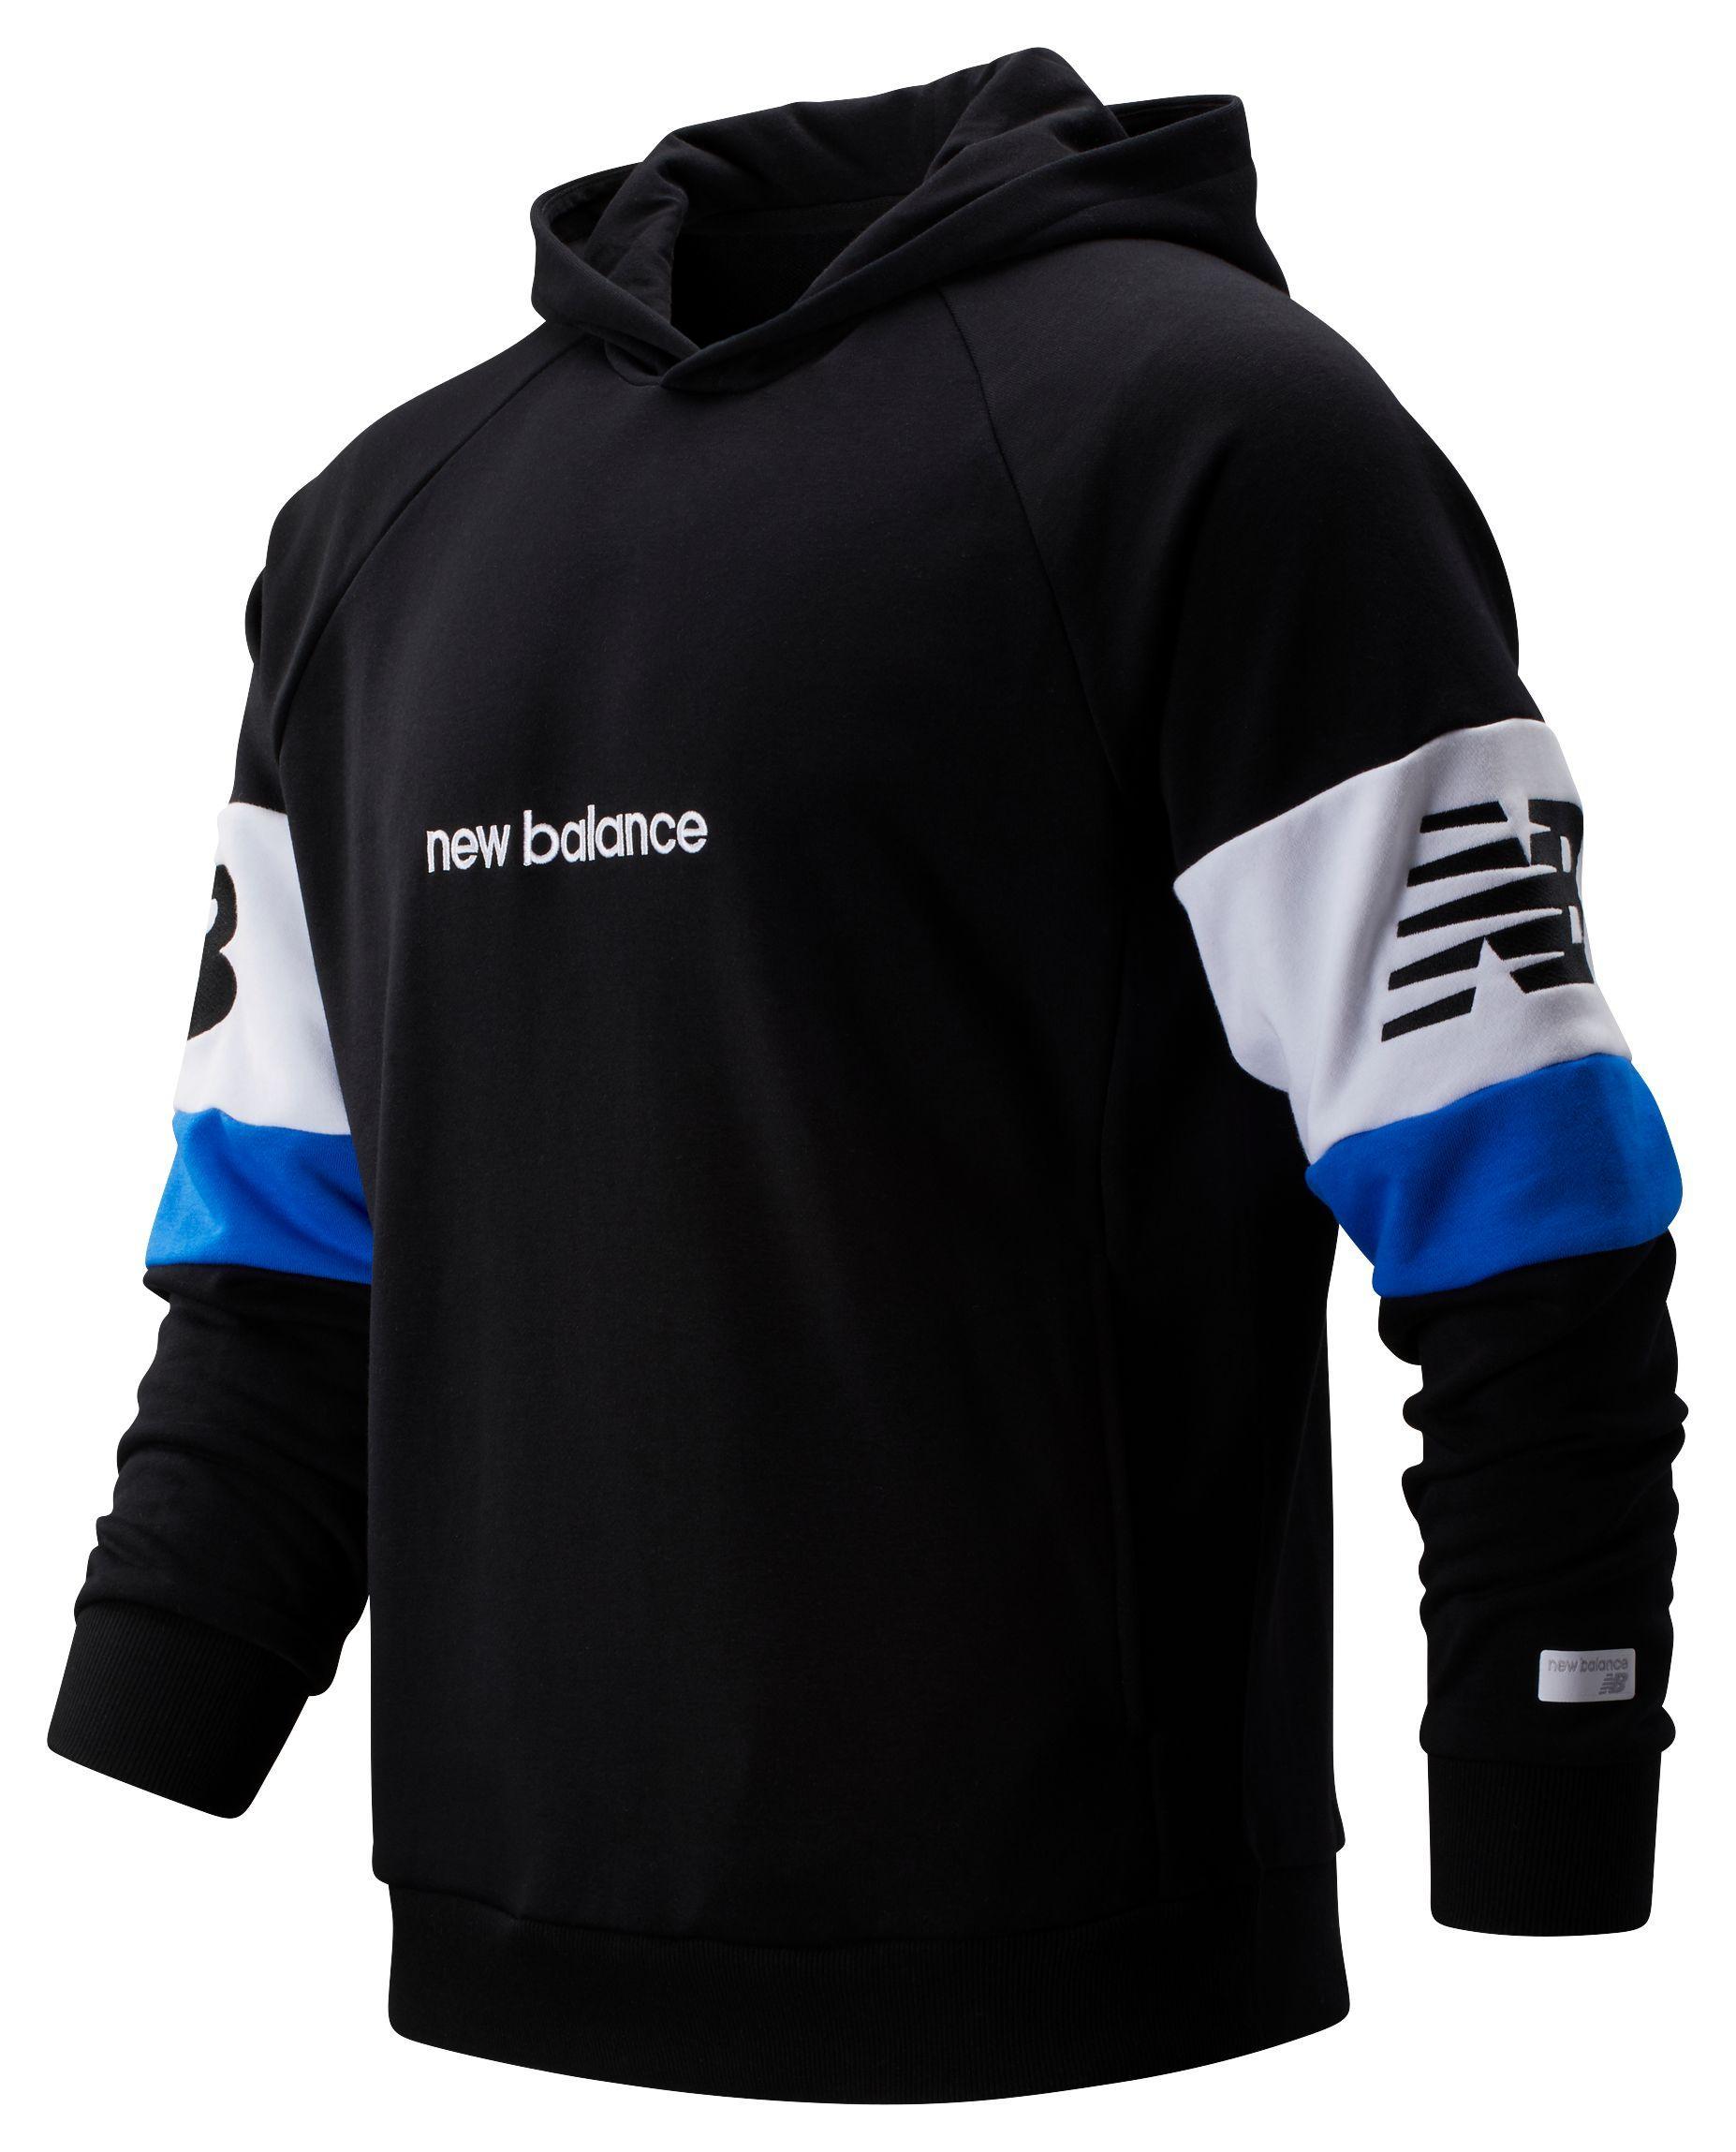 new balance hoodie